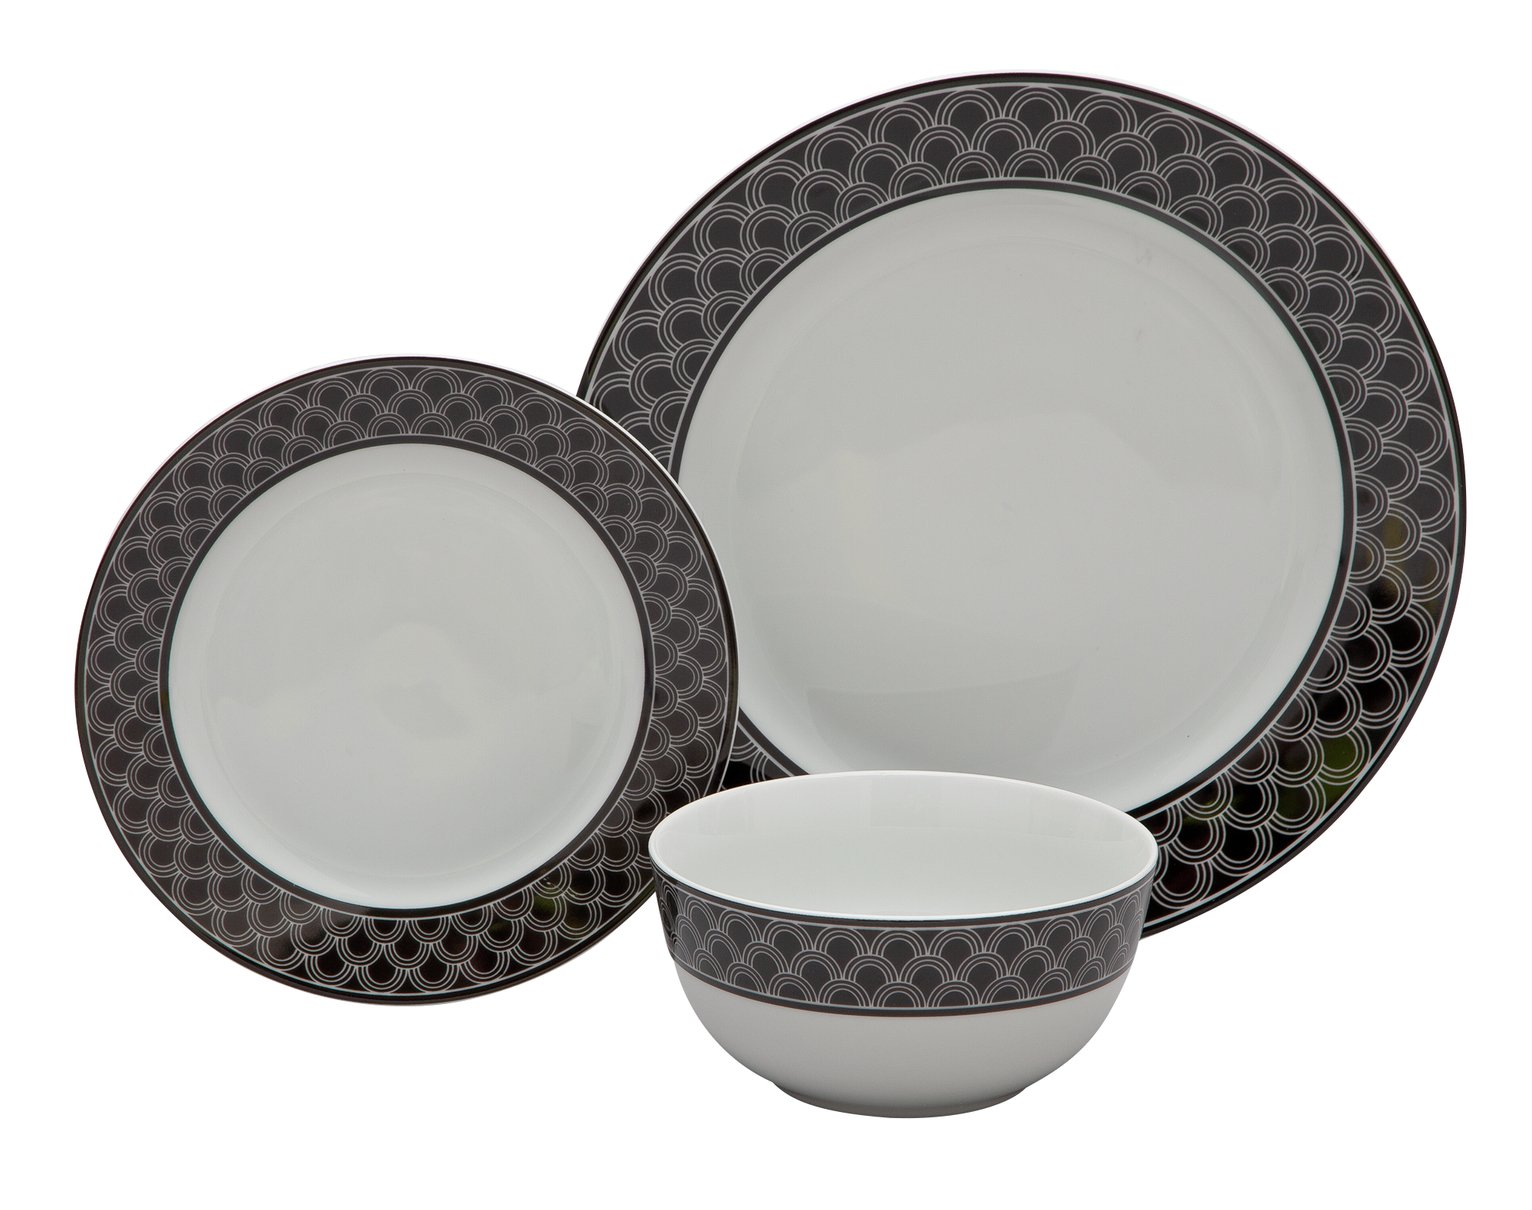 Argos Home Scallop Ceramic 12 Piece Dinner Set - Black